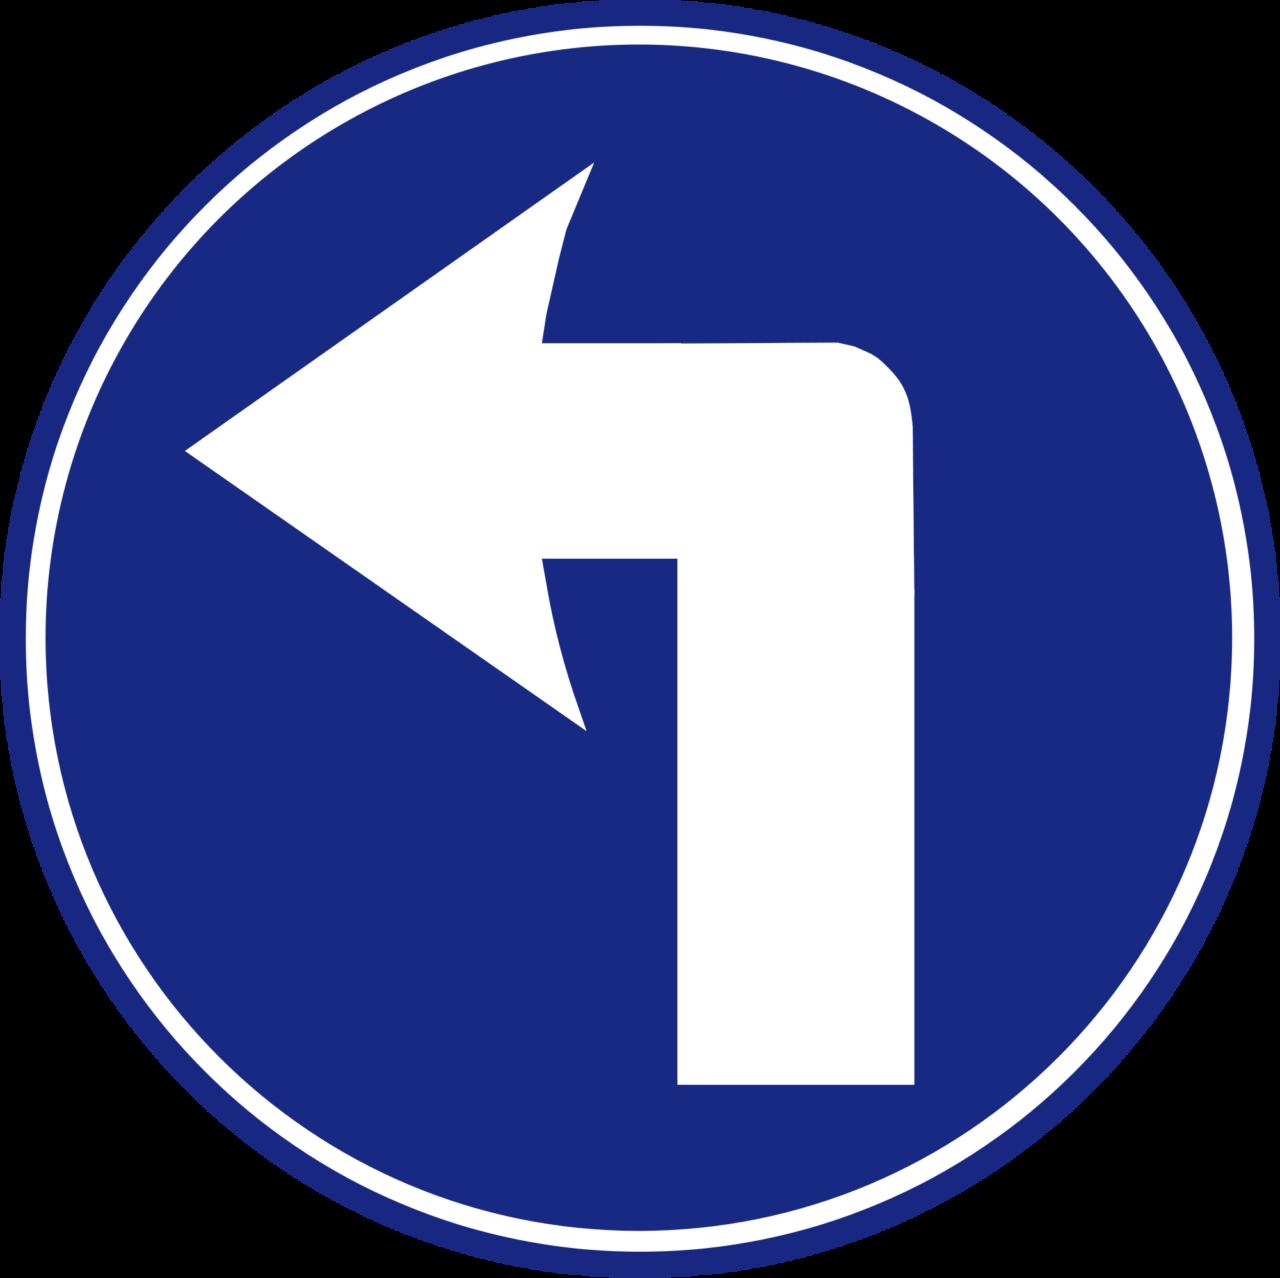 2000px-Mandatory_road_sign_turn_left_ahead